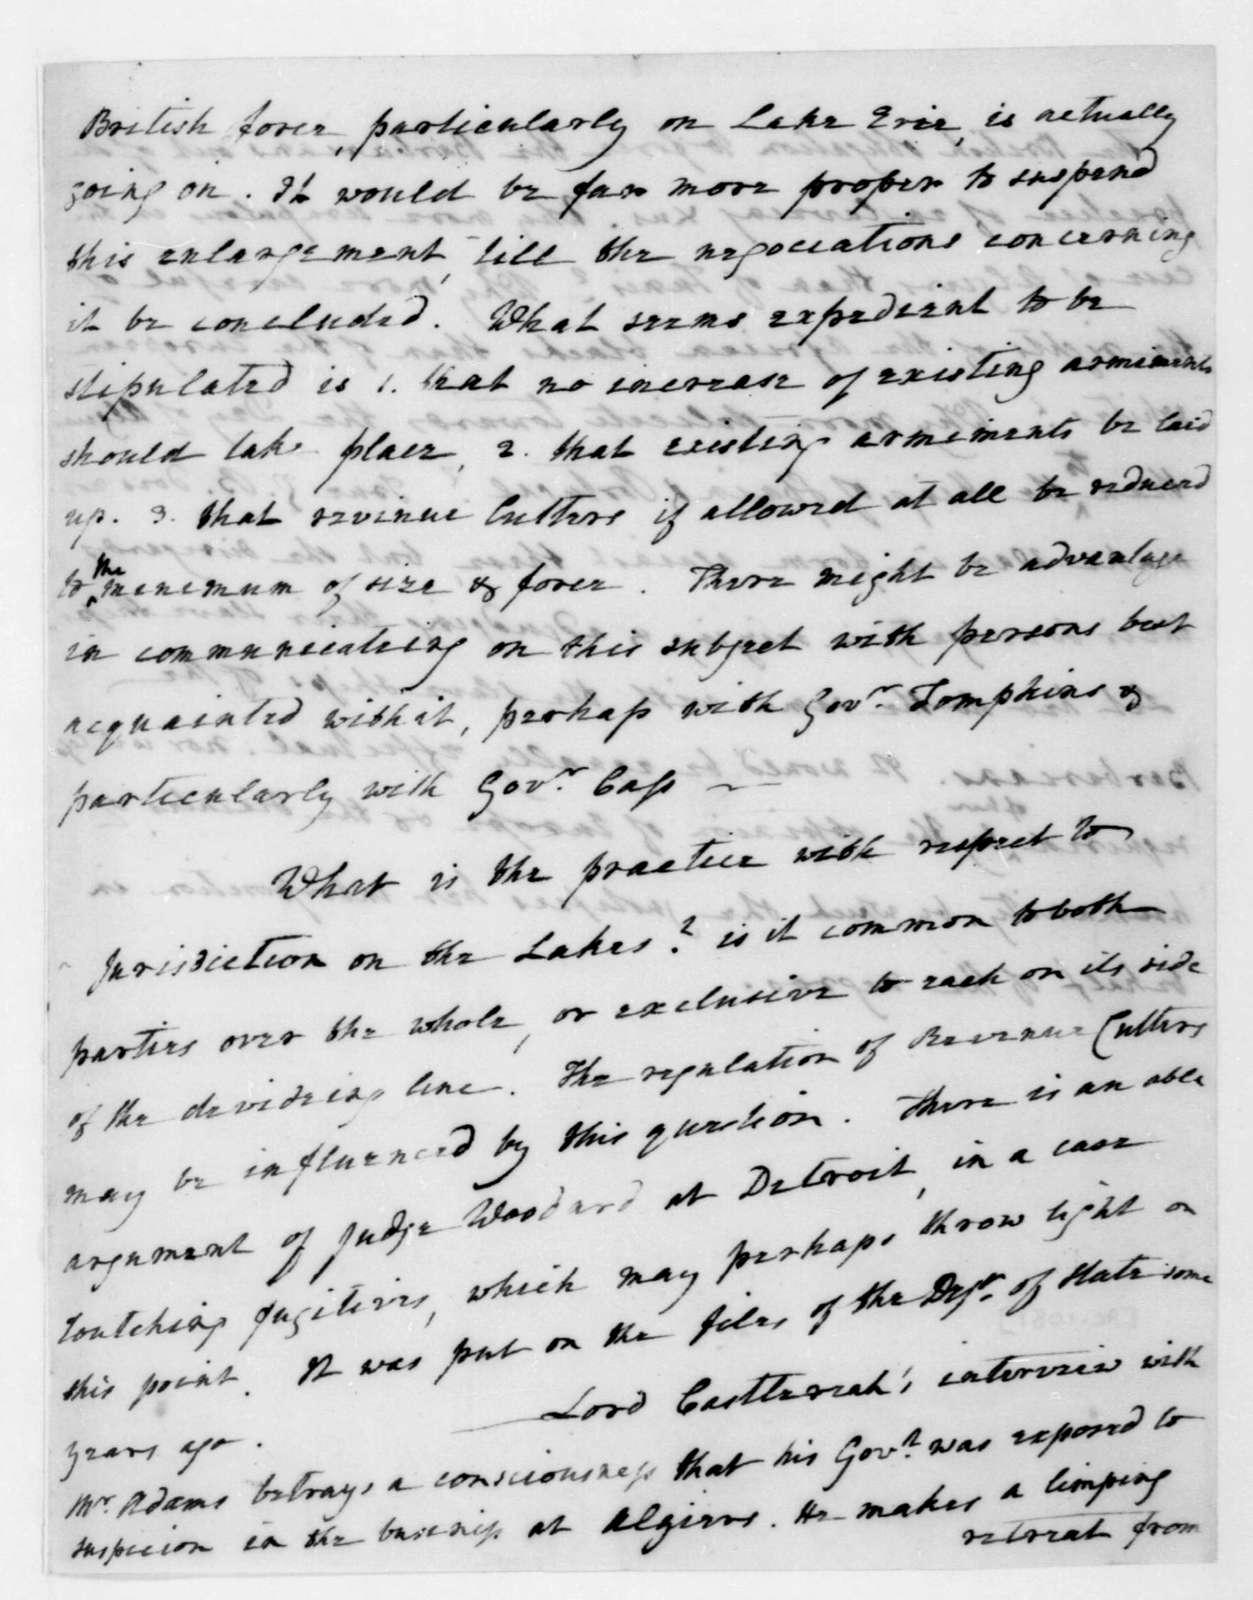 James Madison to James Monroe, July 11, 1816.